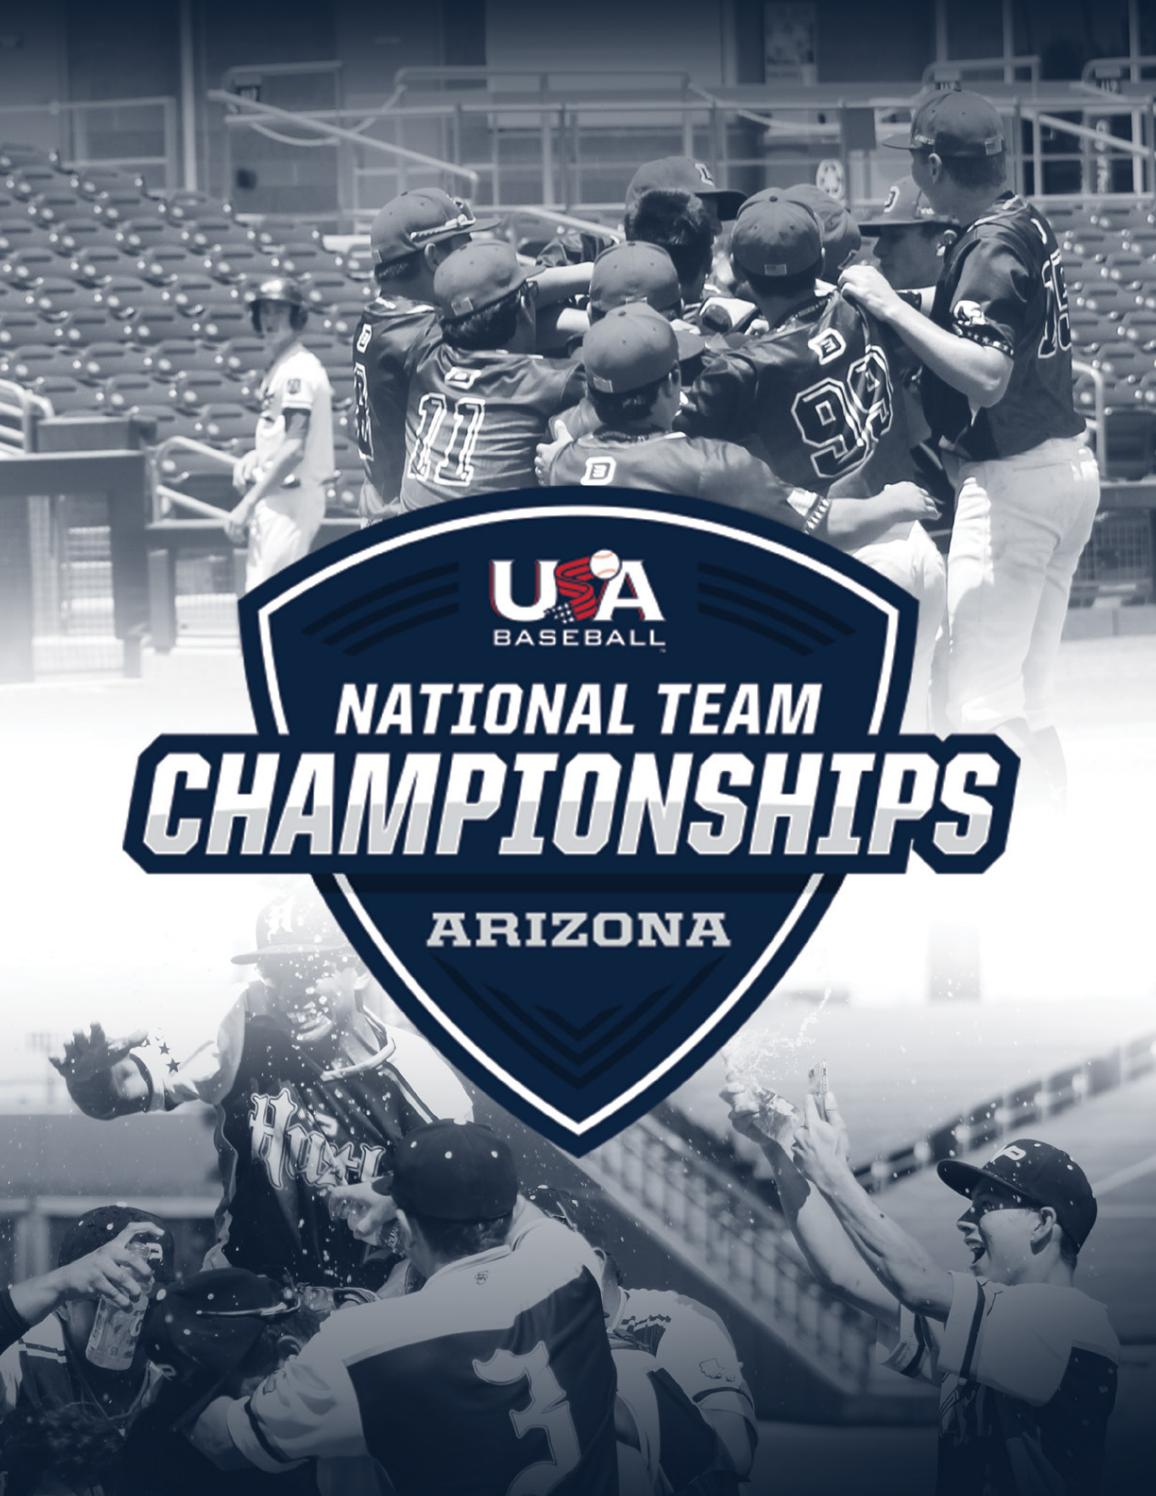 2019 Usa Baseball National Team Championships (Arizona Pertaining To The University Of Phoenix Inc Calendar 2021/2020